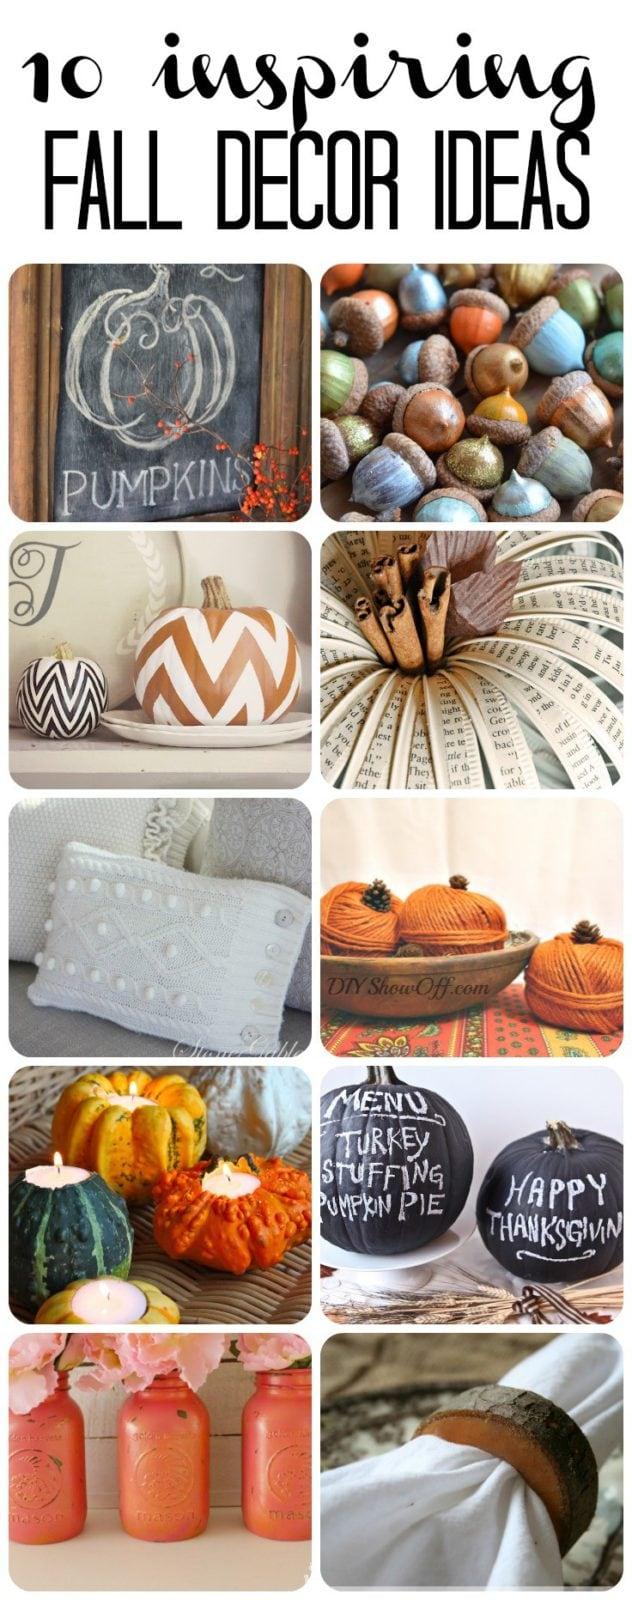 10 Inspiring DIY Fall Decor Ideas!